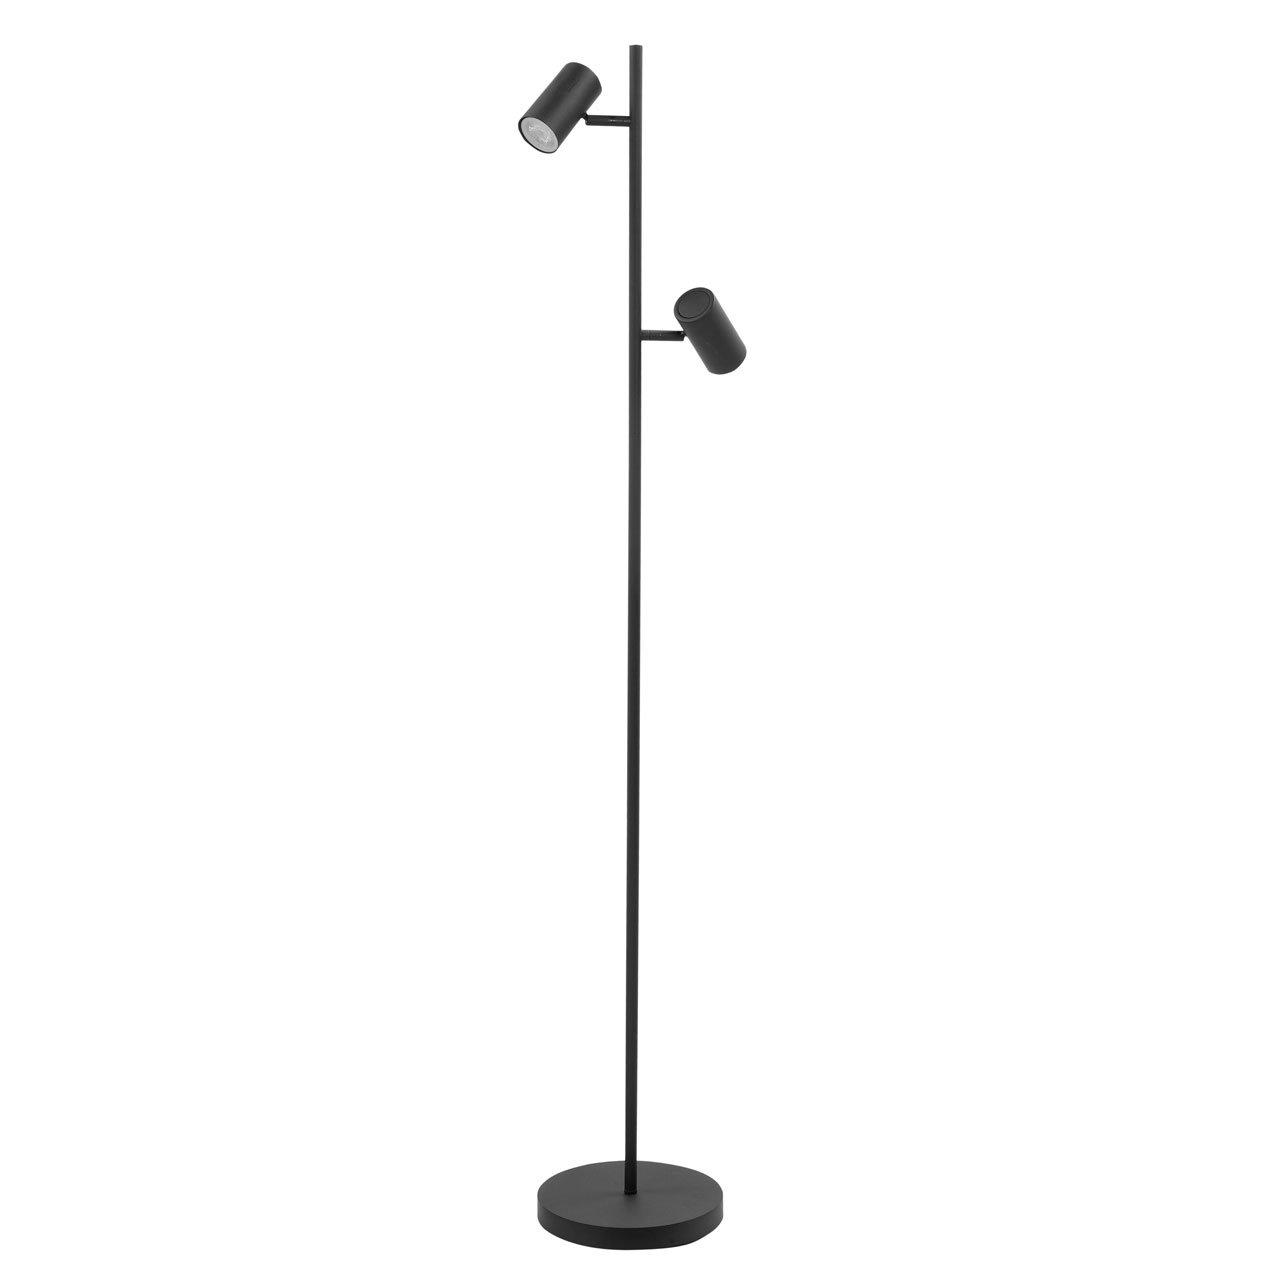 Vloerlamp Highlight Burgos Zwart Dubbel